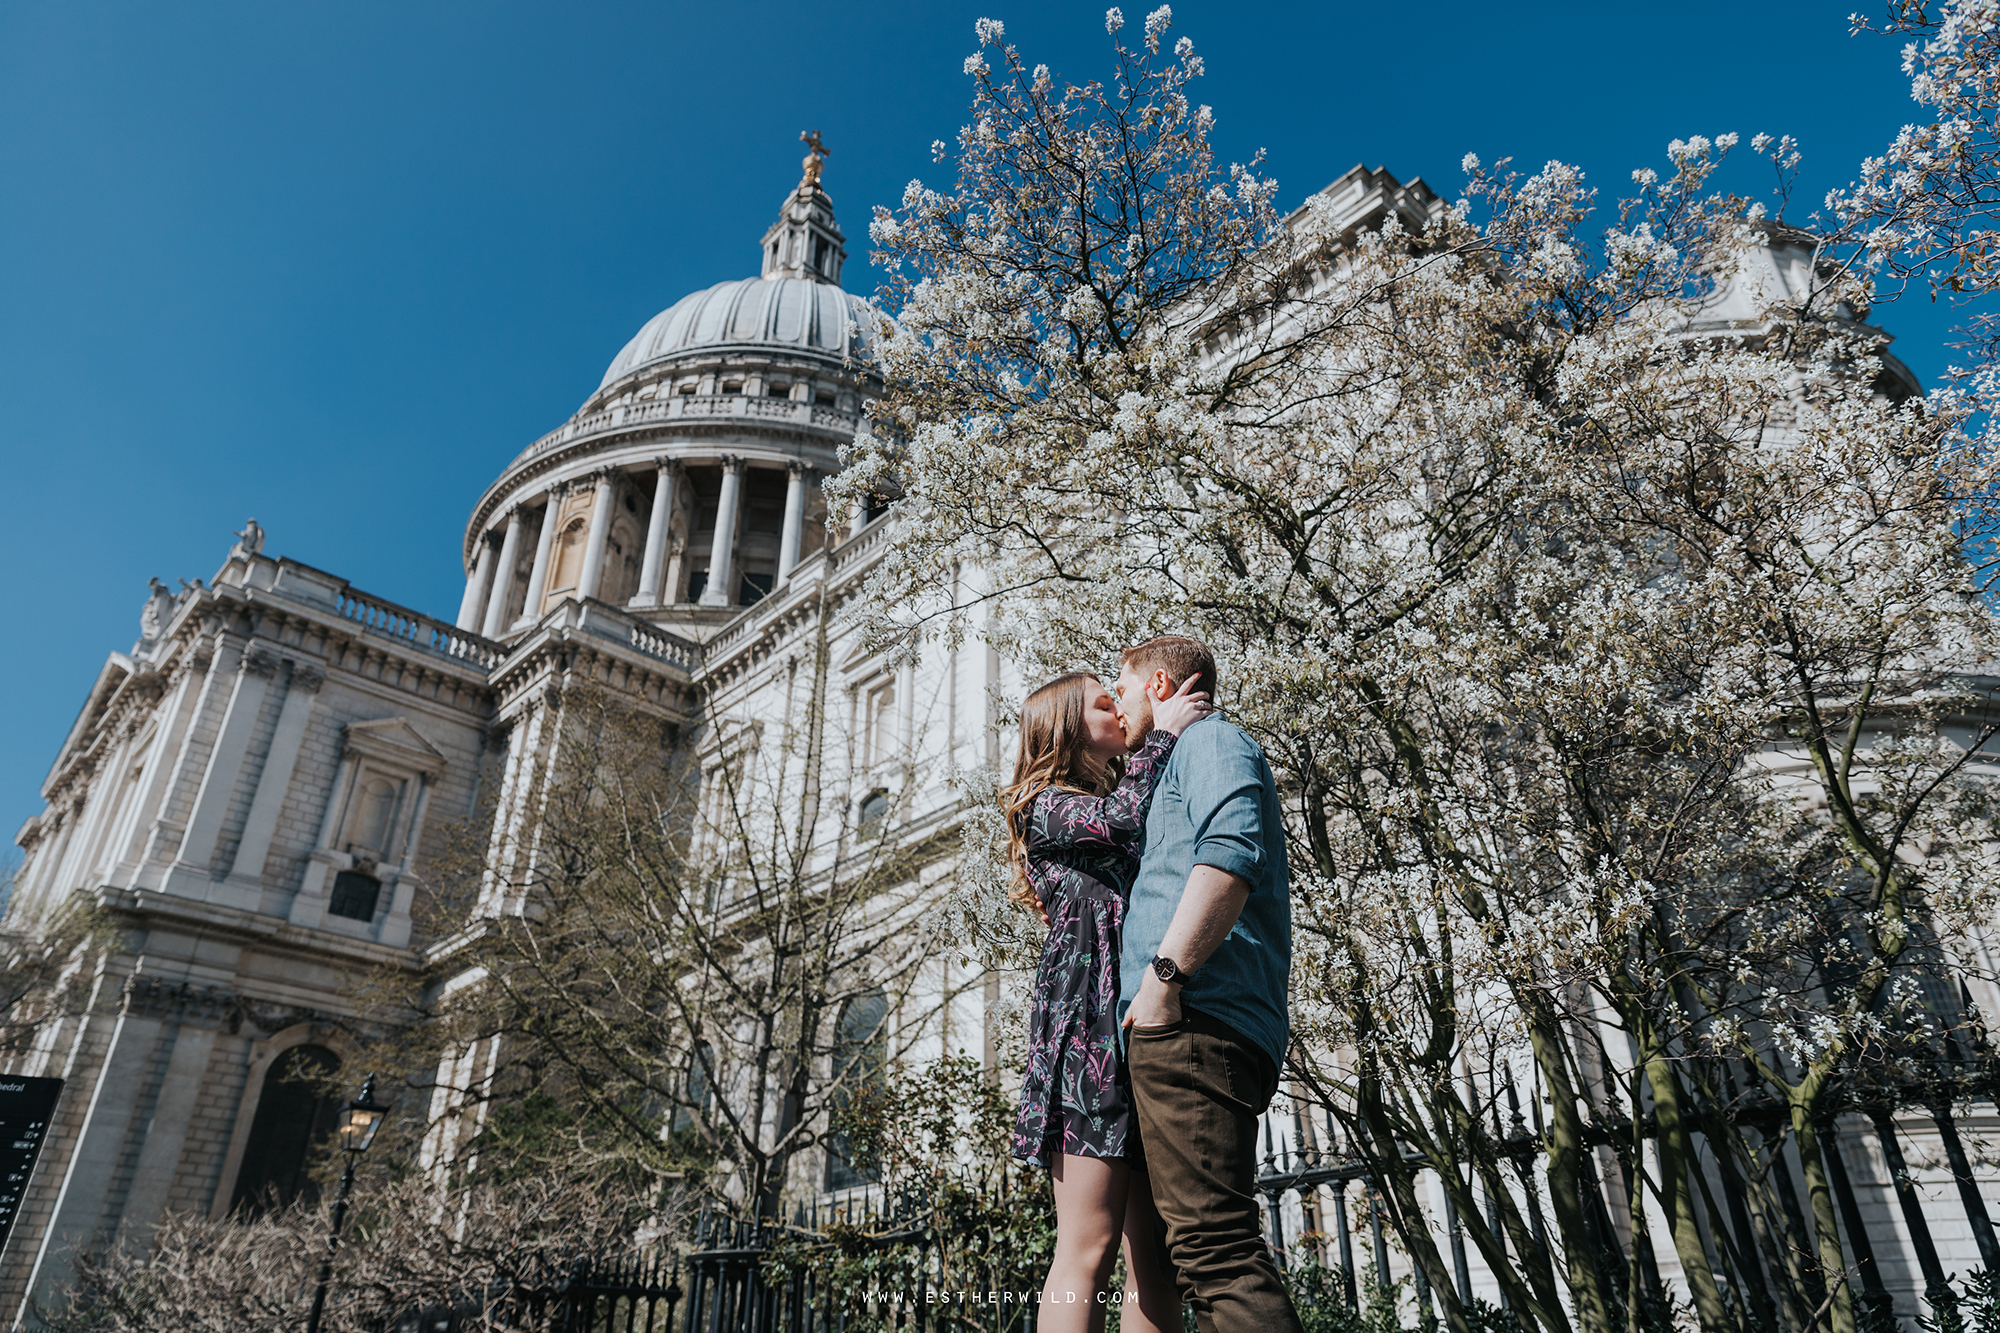 London_Engagement_Session_Pre-Wedding_Photo_Shoot_Esther_Wild_Photographer_IMG_0327.jpg